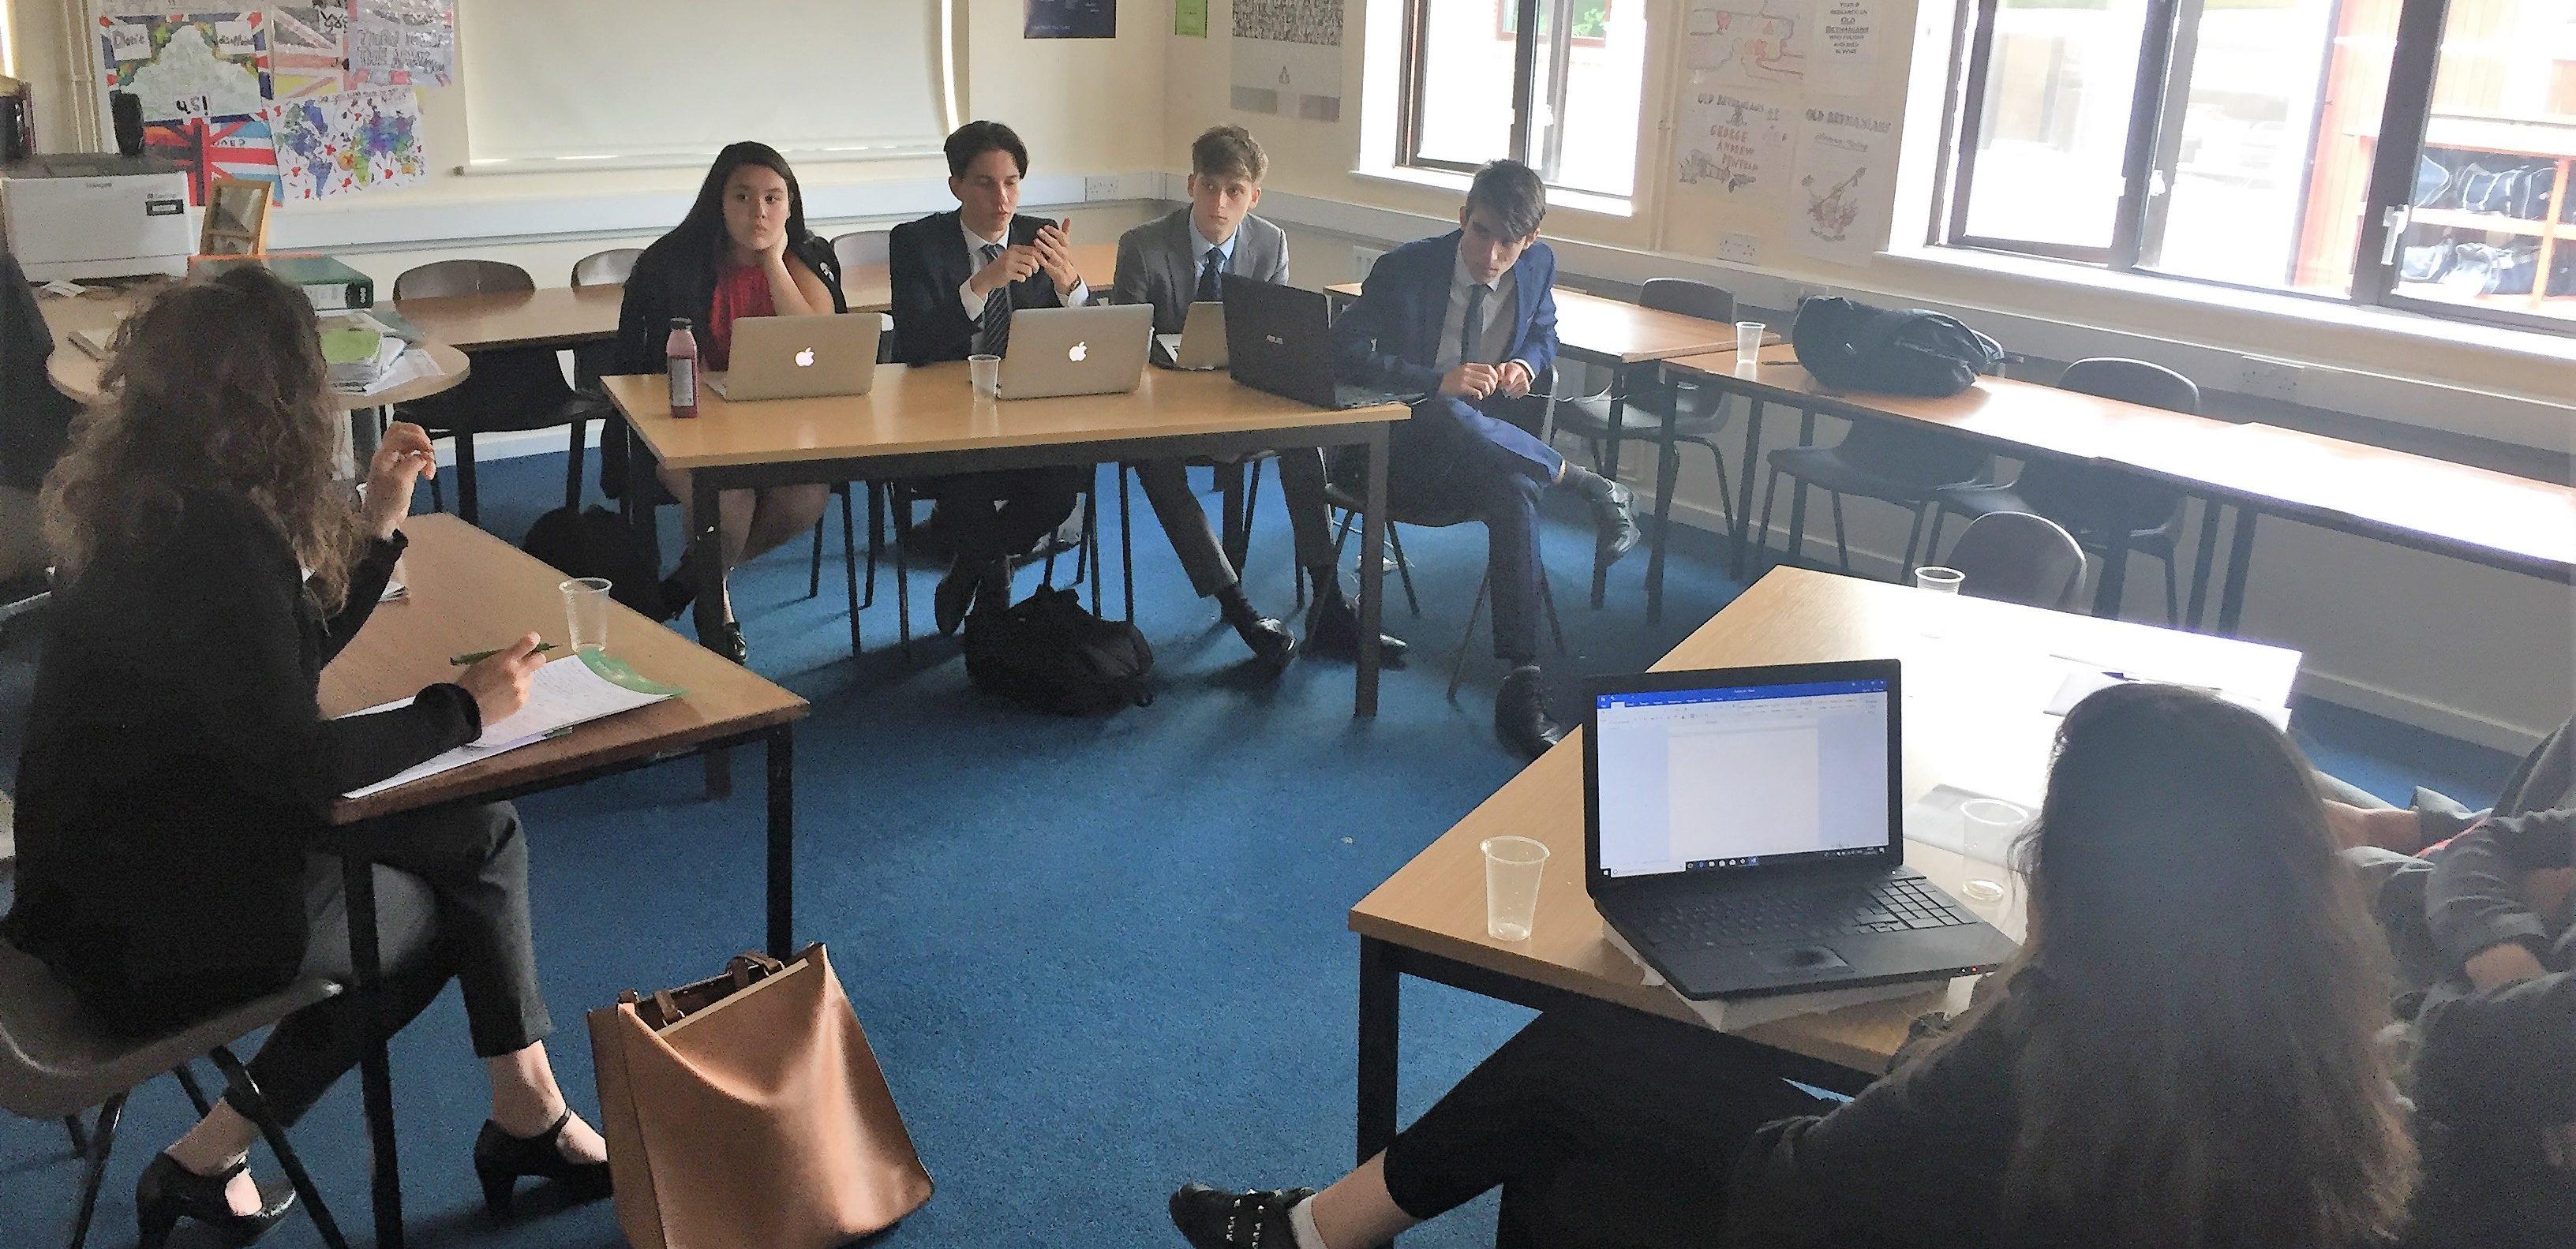 Year 12 pupils debate